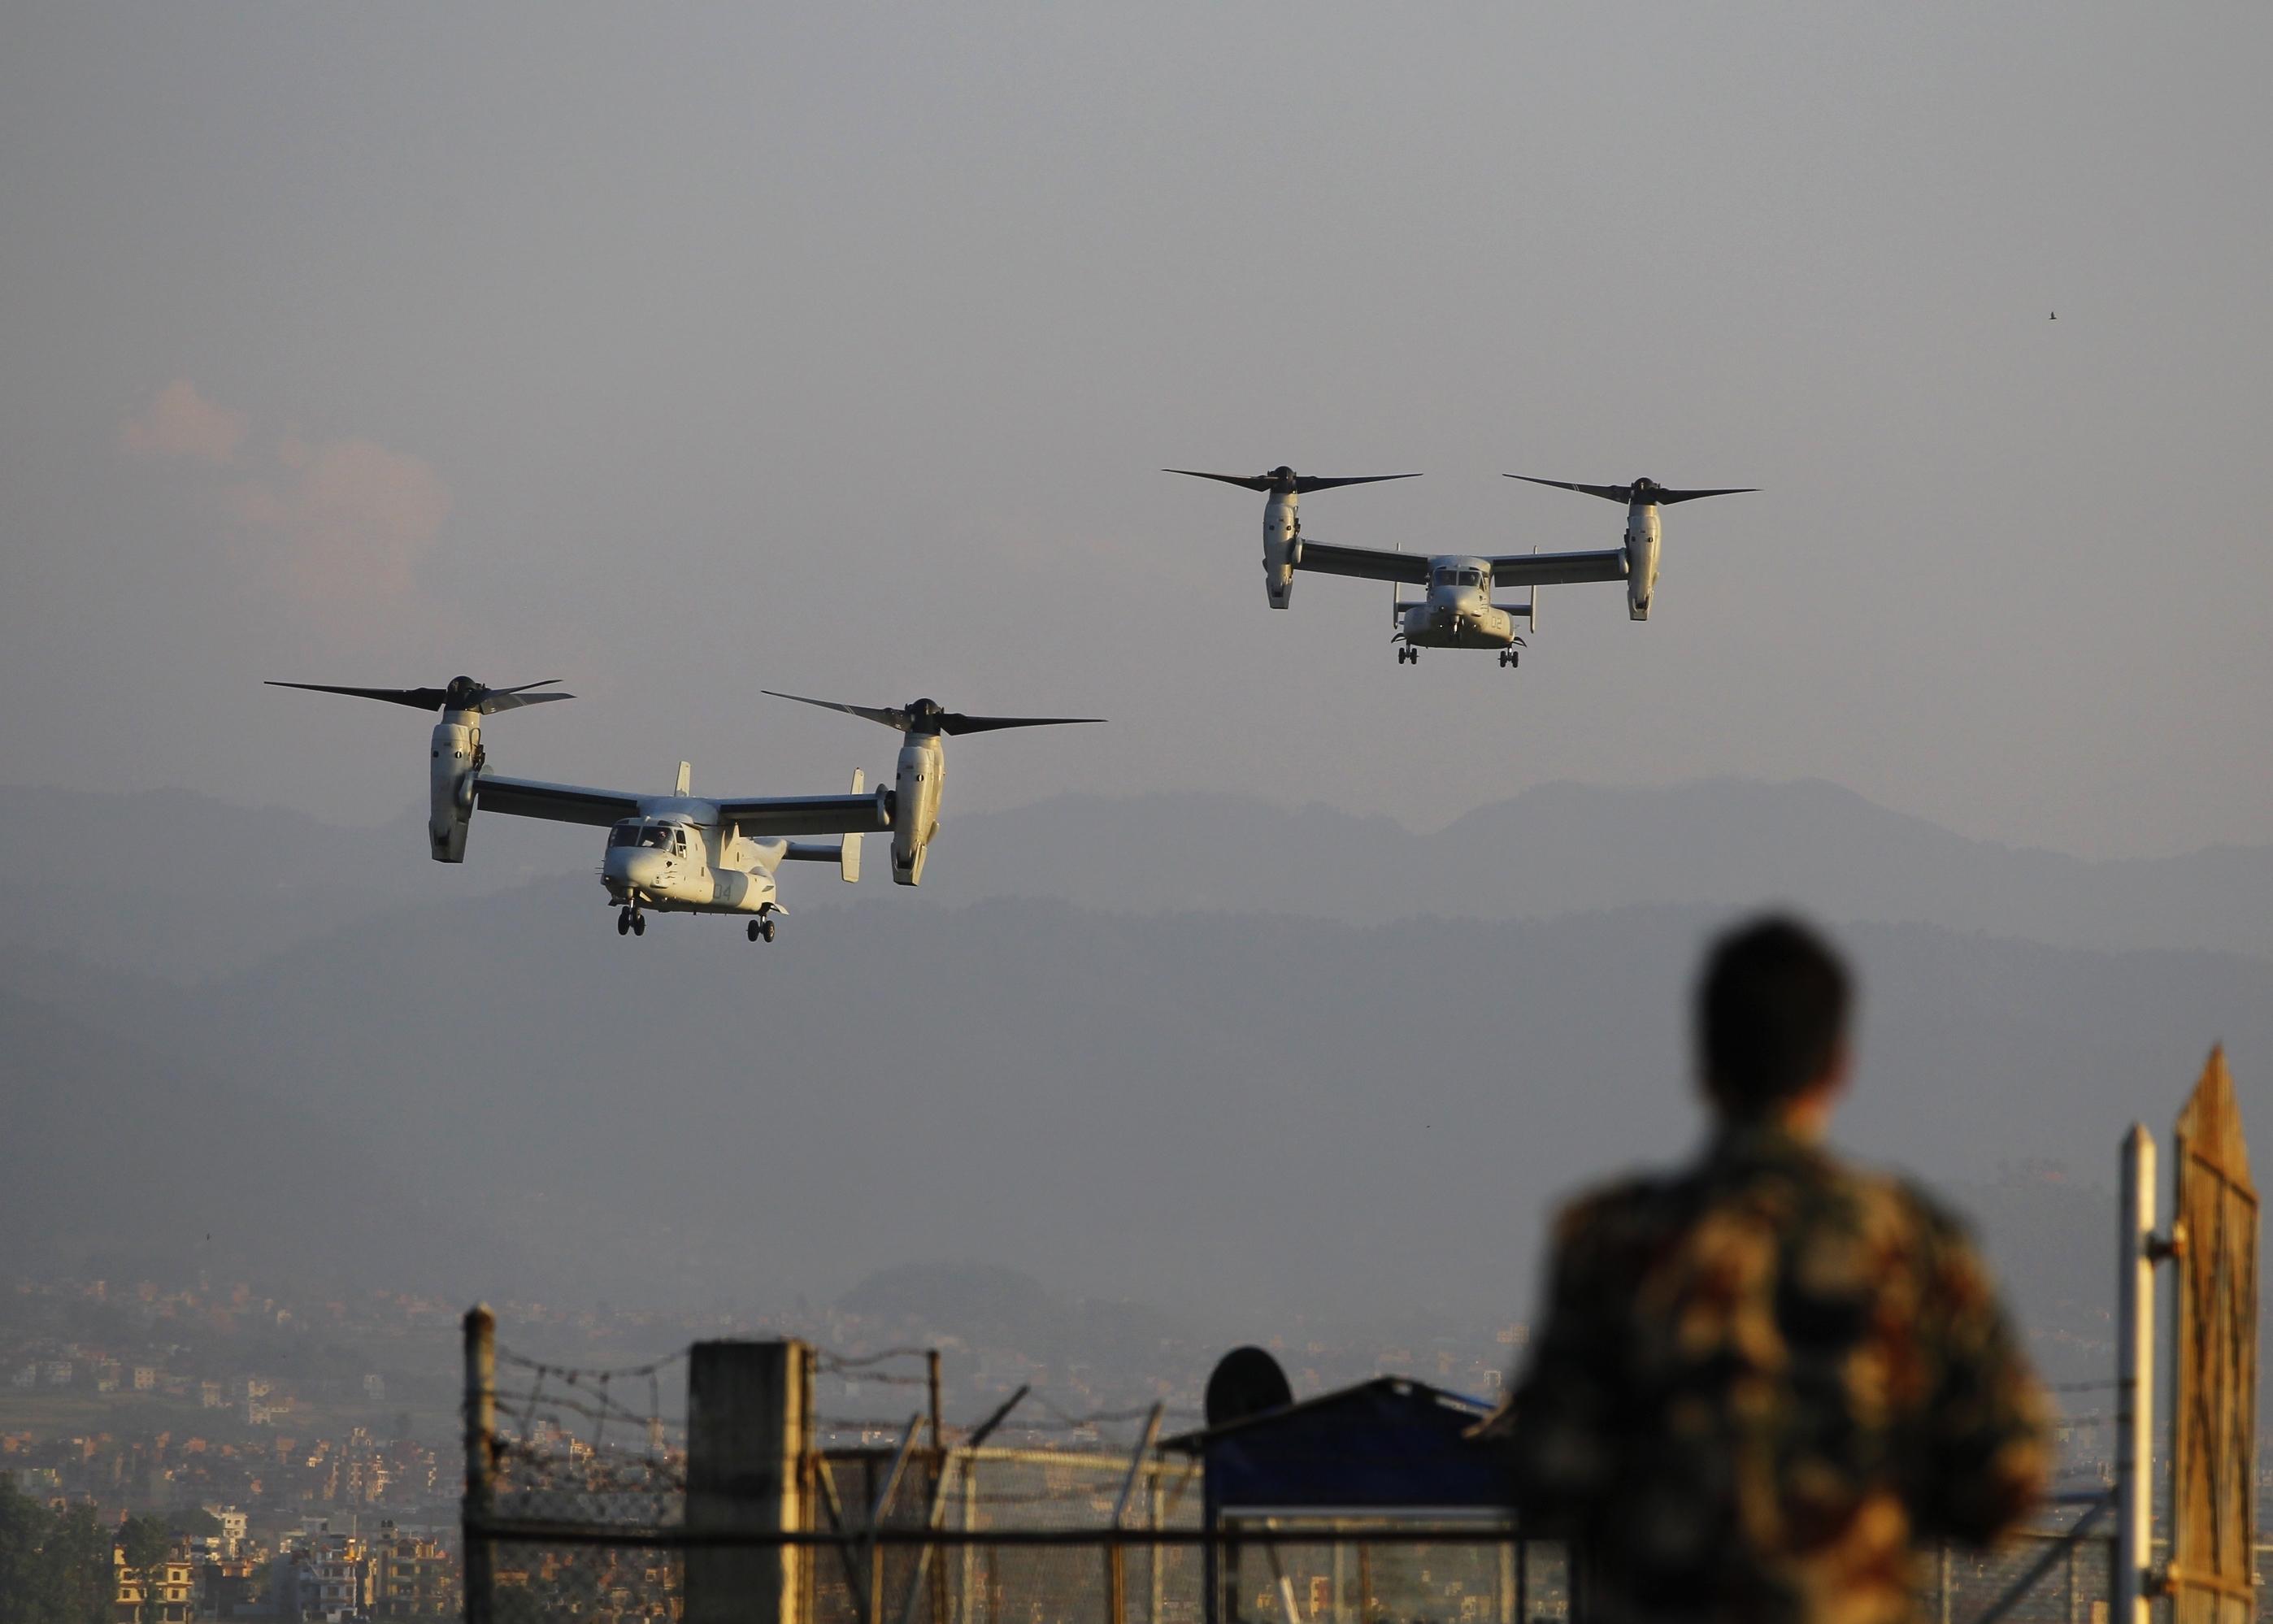 U.S. Marines Arrive In Nepal To Aid Earthquake Victims